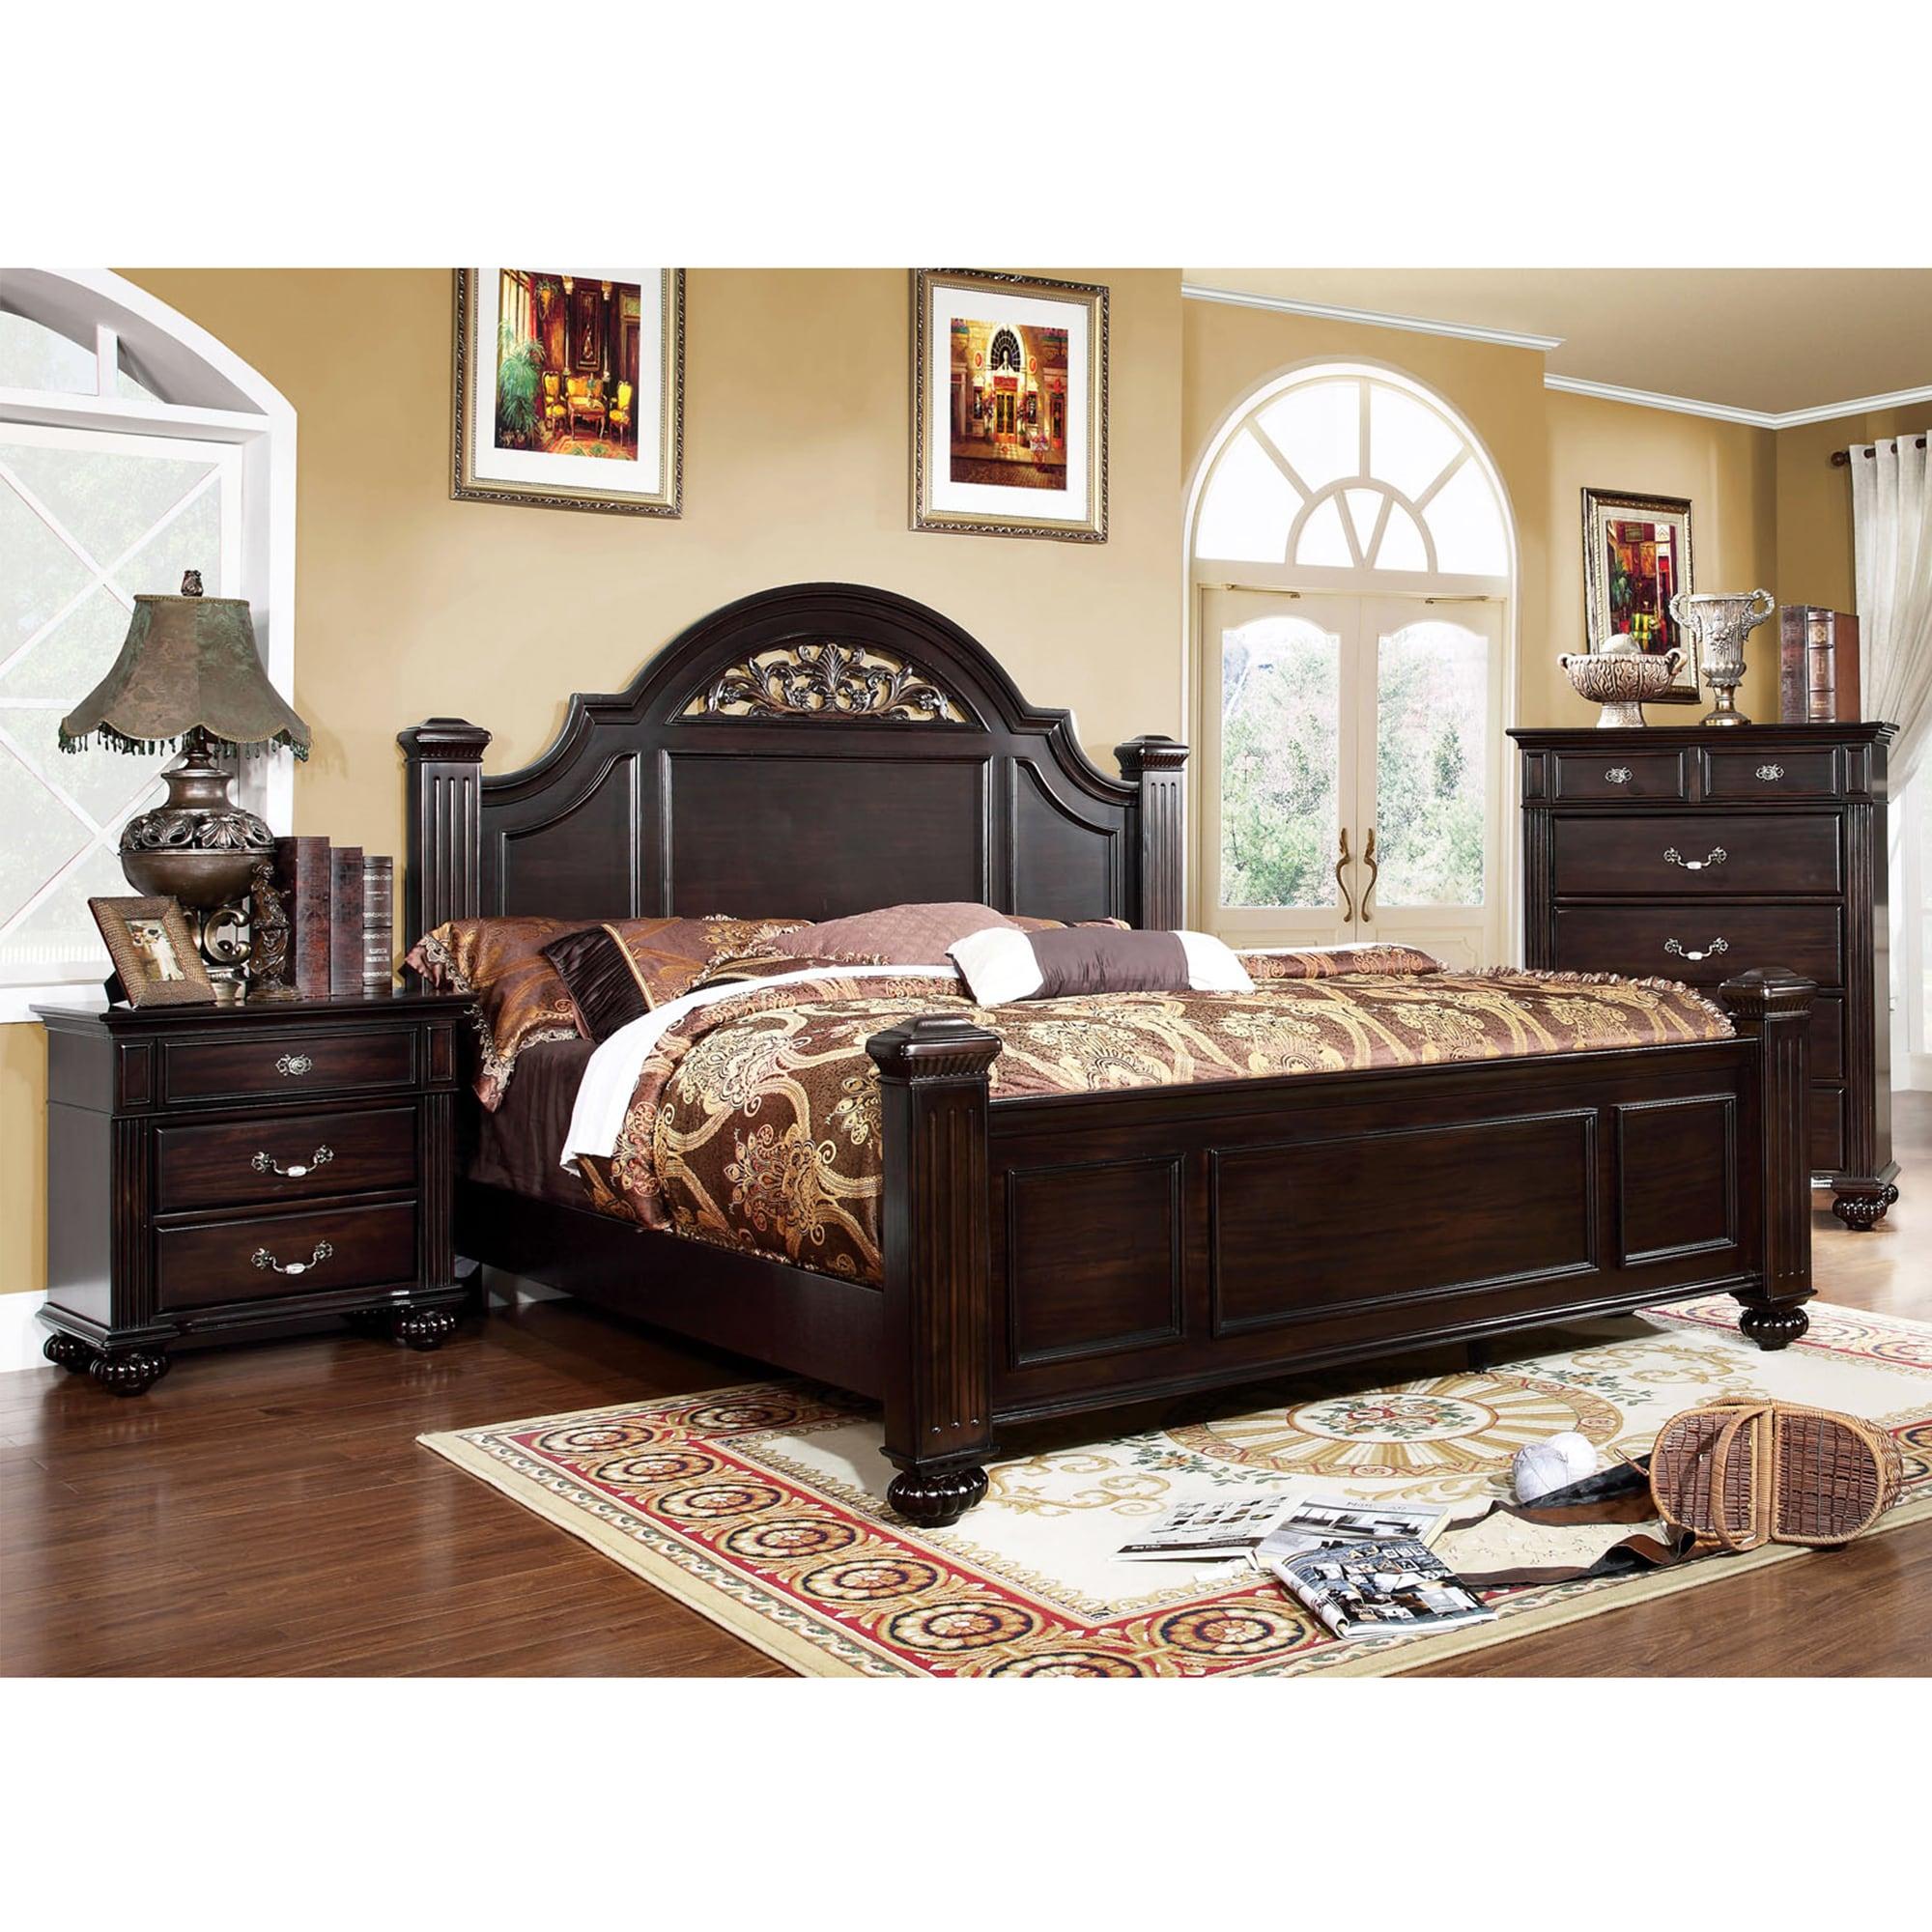 Cheap Warehouse Furniture: Furniture Of America Grande 2-Piece Dark Walnut Bed With